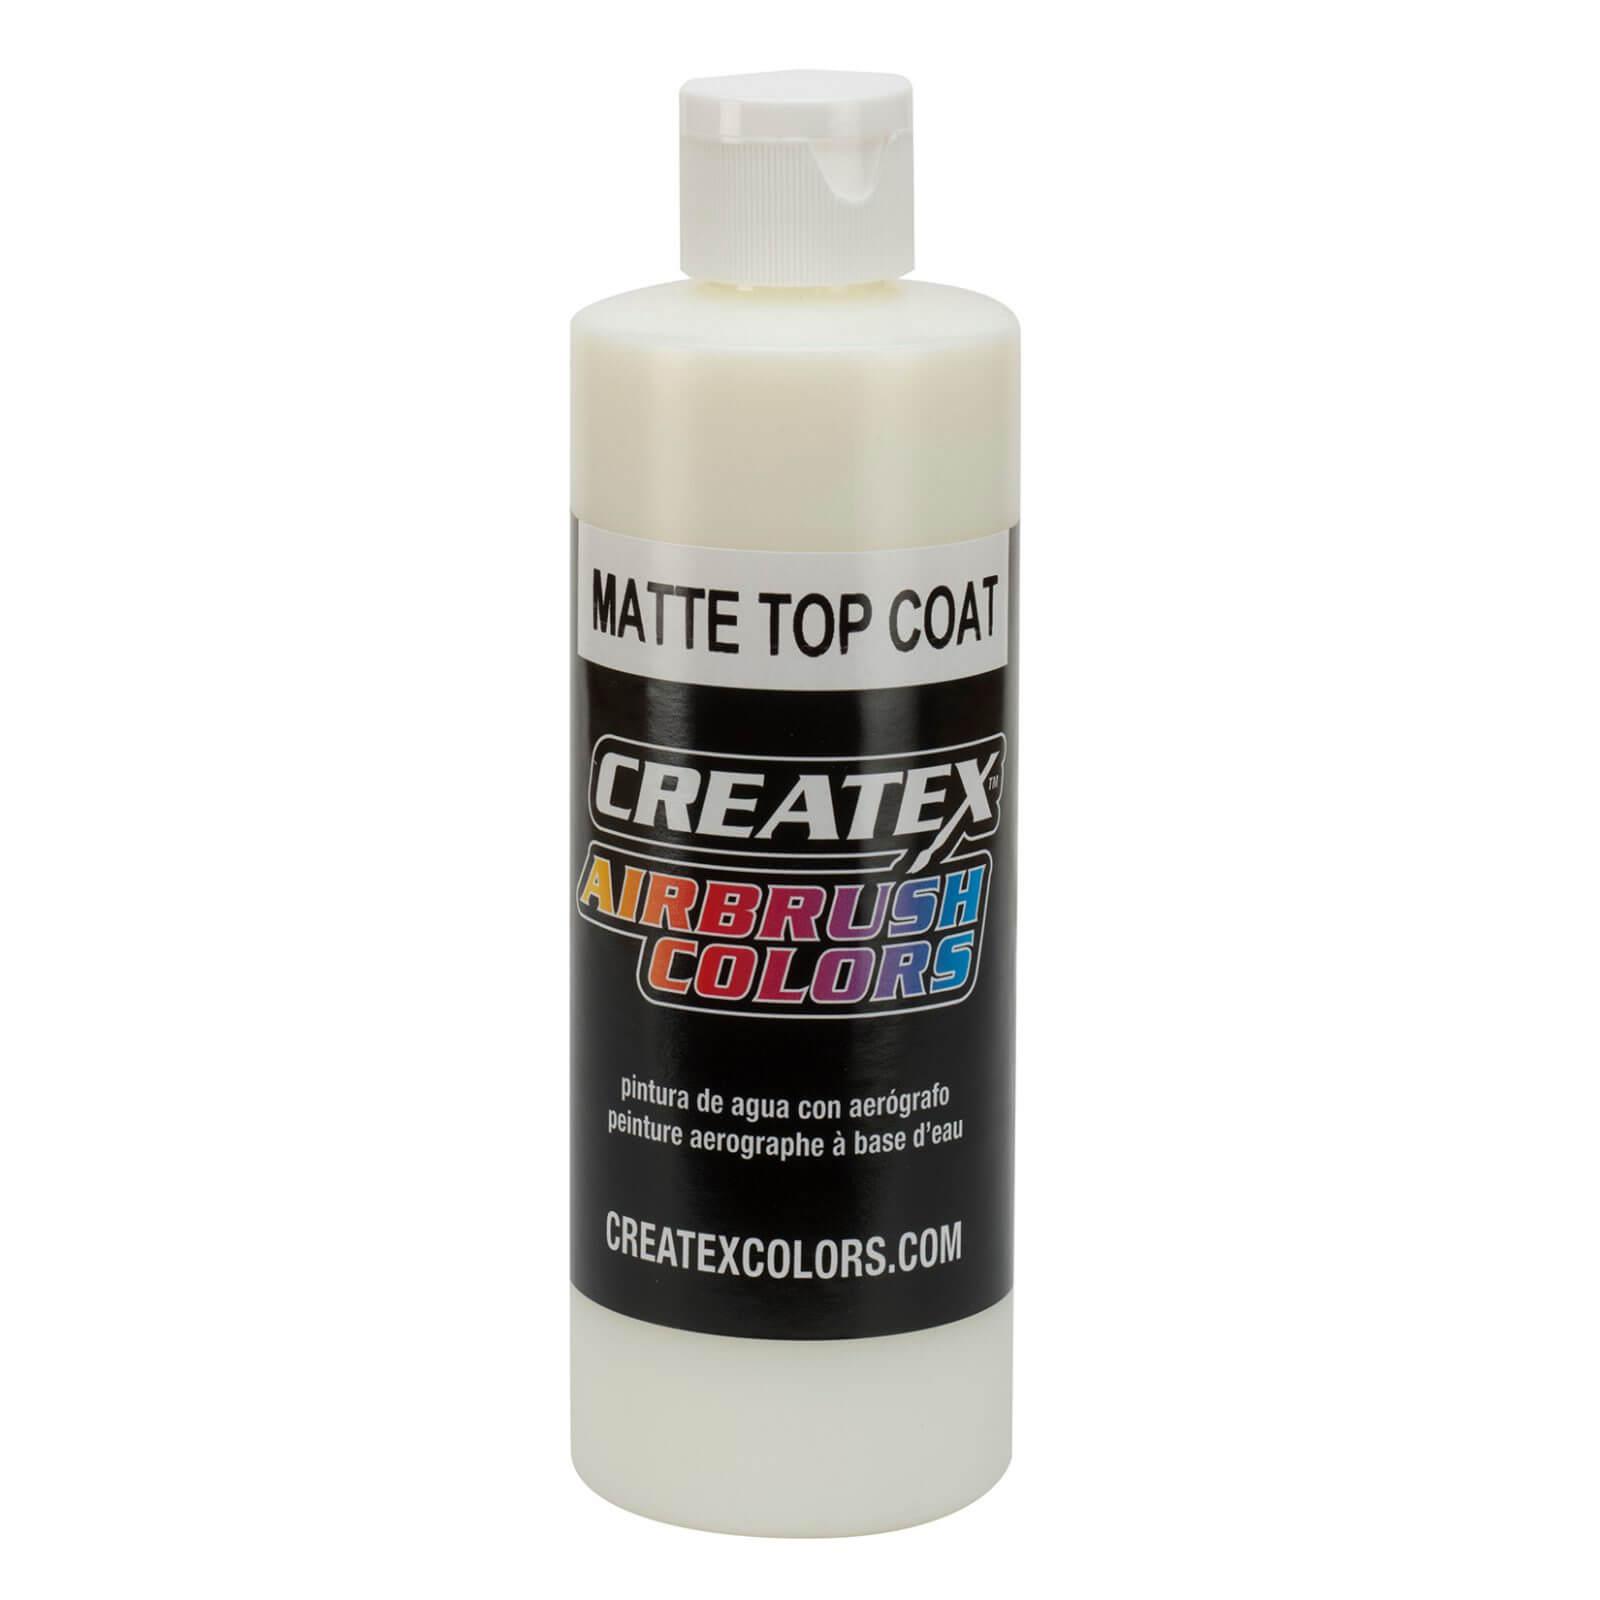 Matte Top Coat: Airbrush Paint Direct